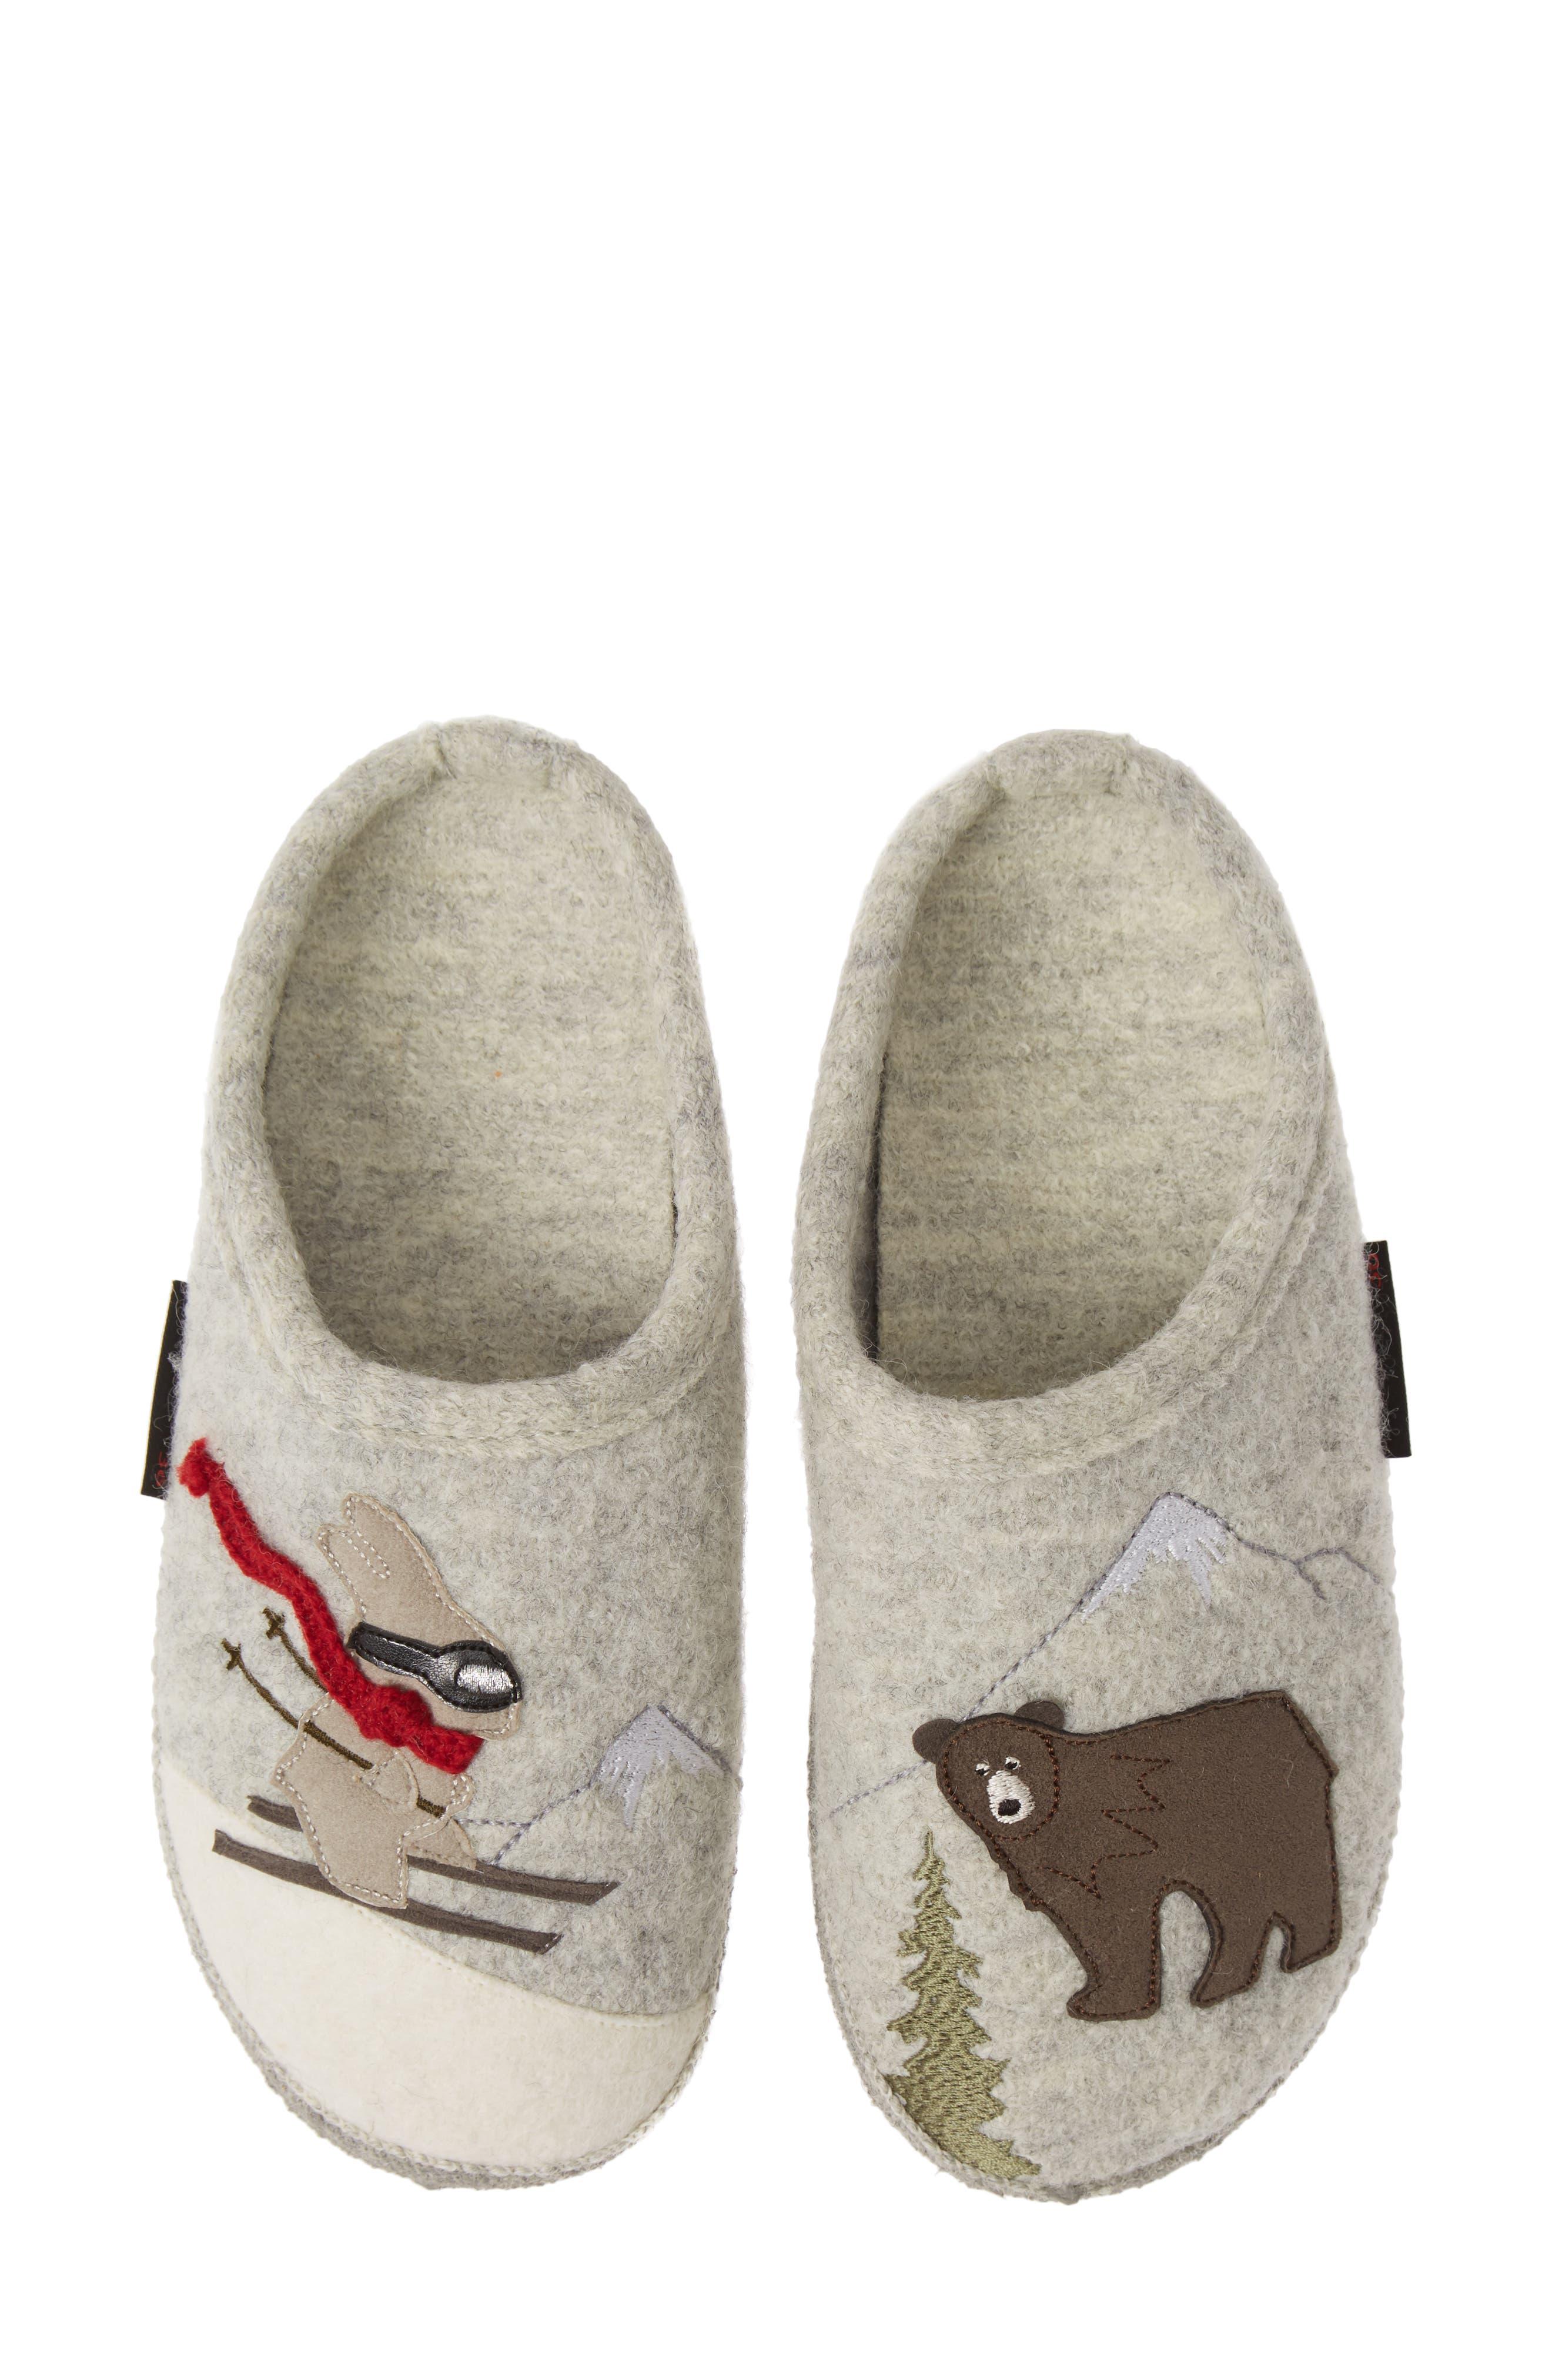 Women's Giesswein Shoes | Nordstrom